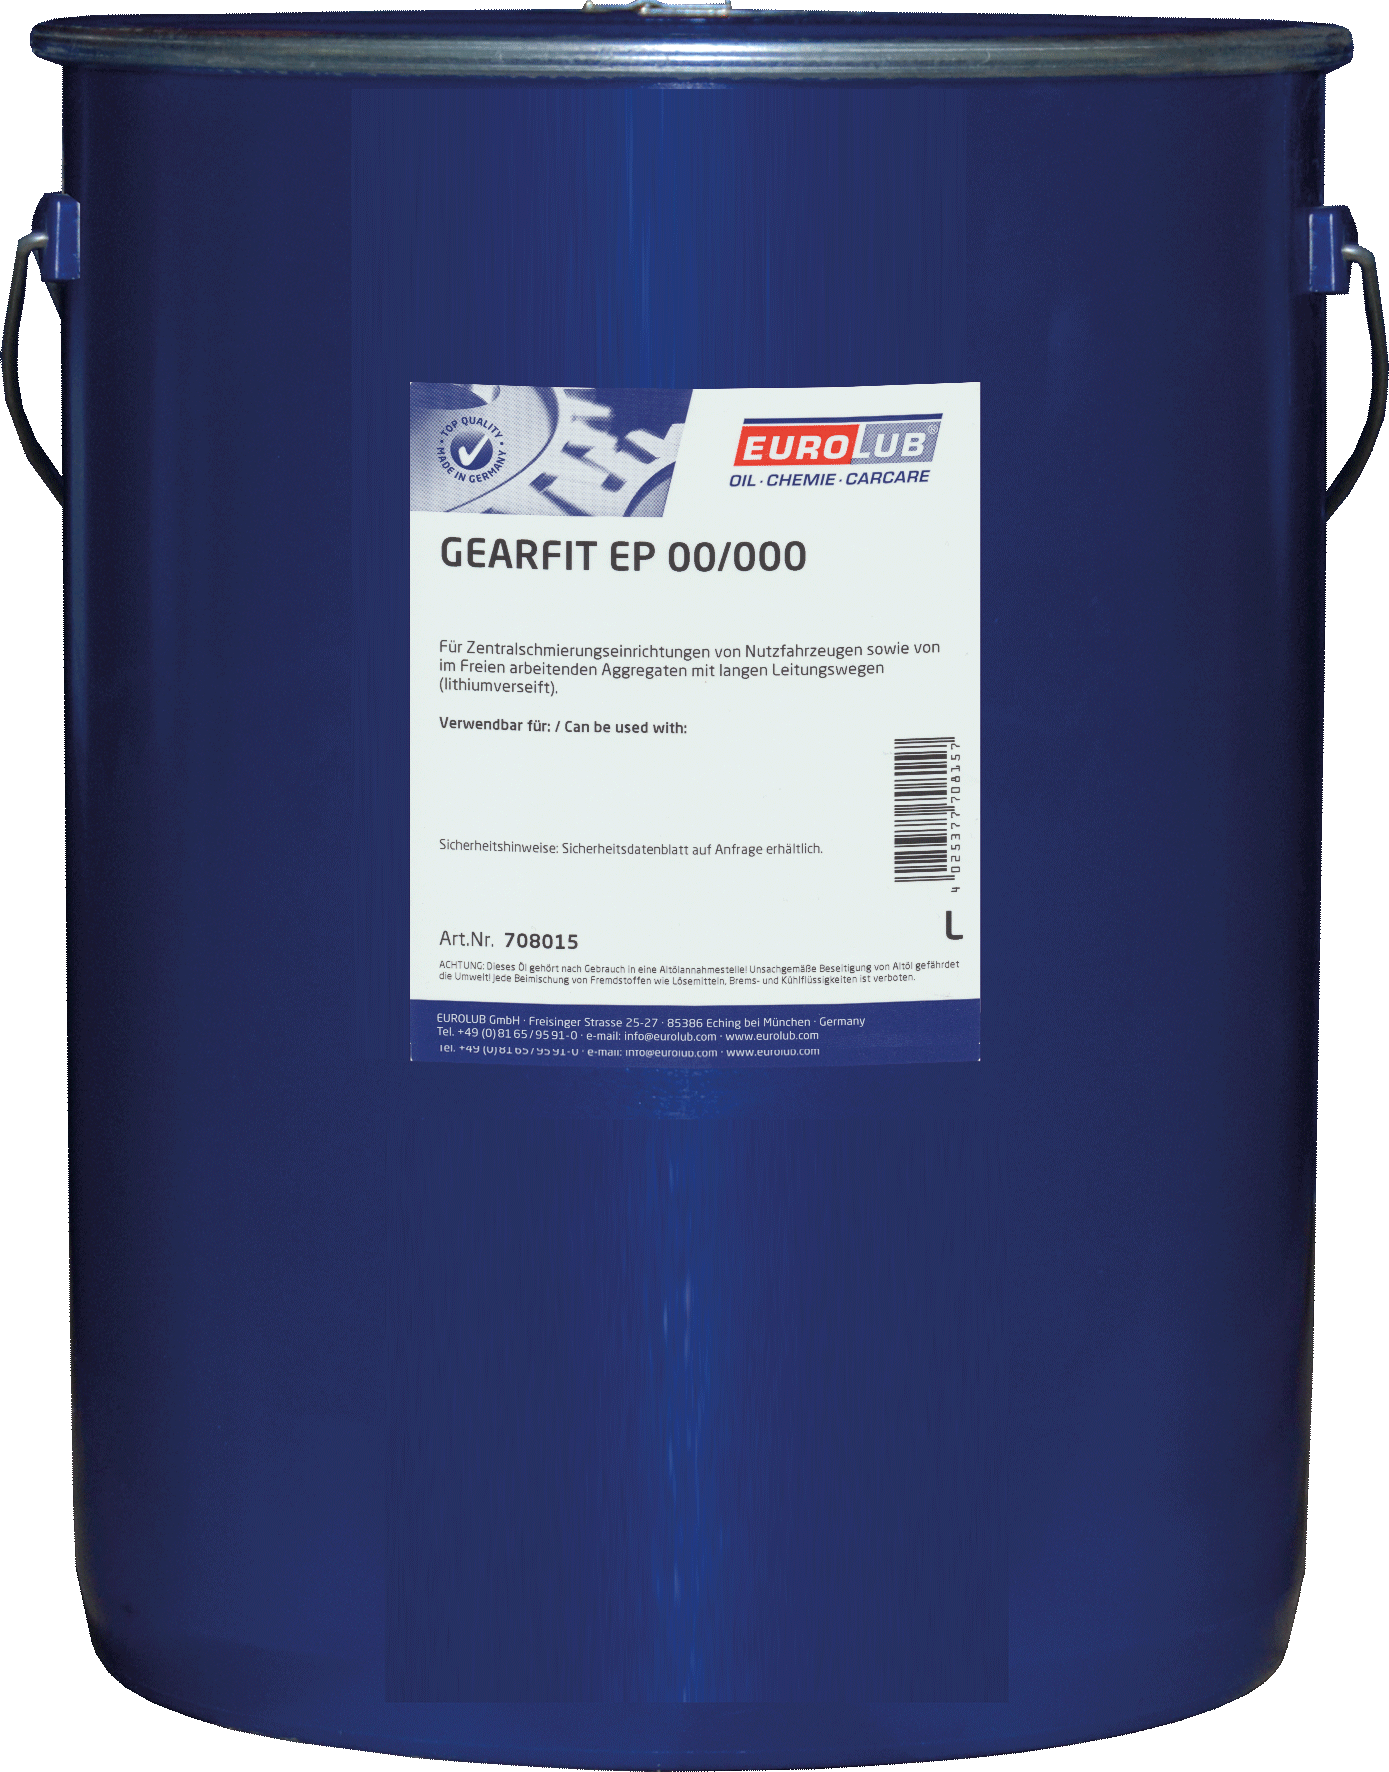 Eurolub Gearfit EP00/000 (смазка для централизованных систем), 15л